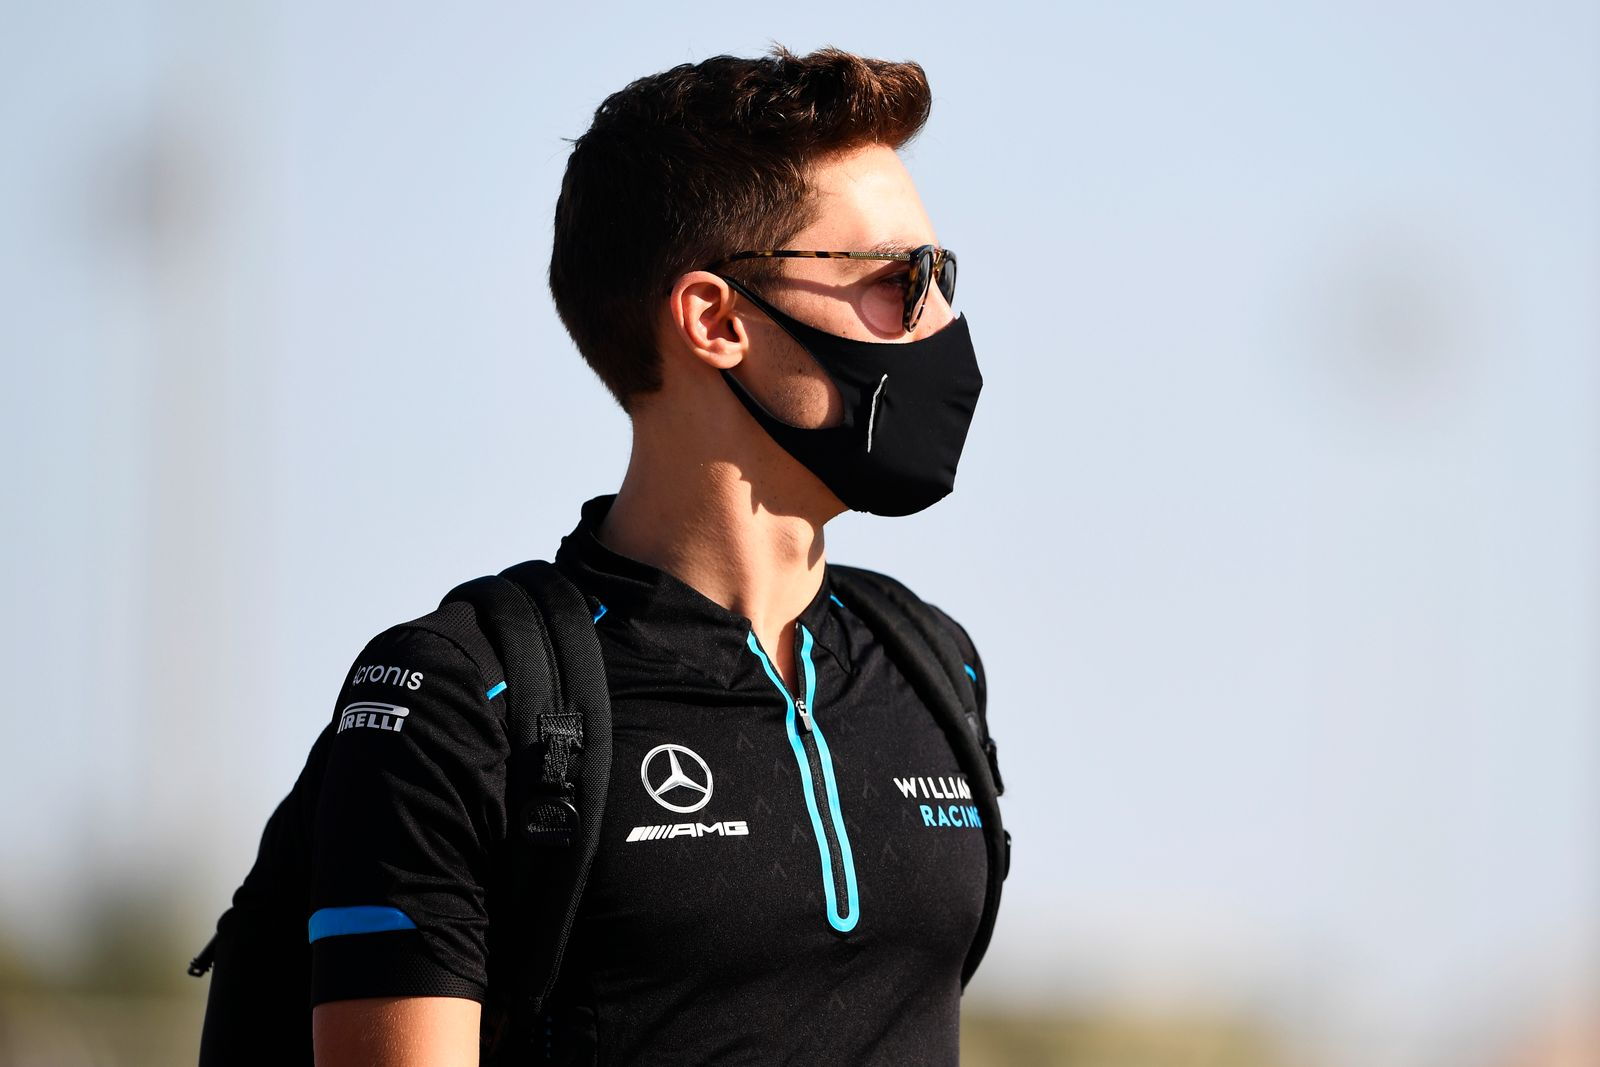 F1 Grand Prix of Bahrain - Previews